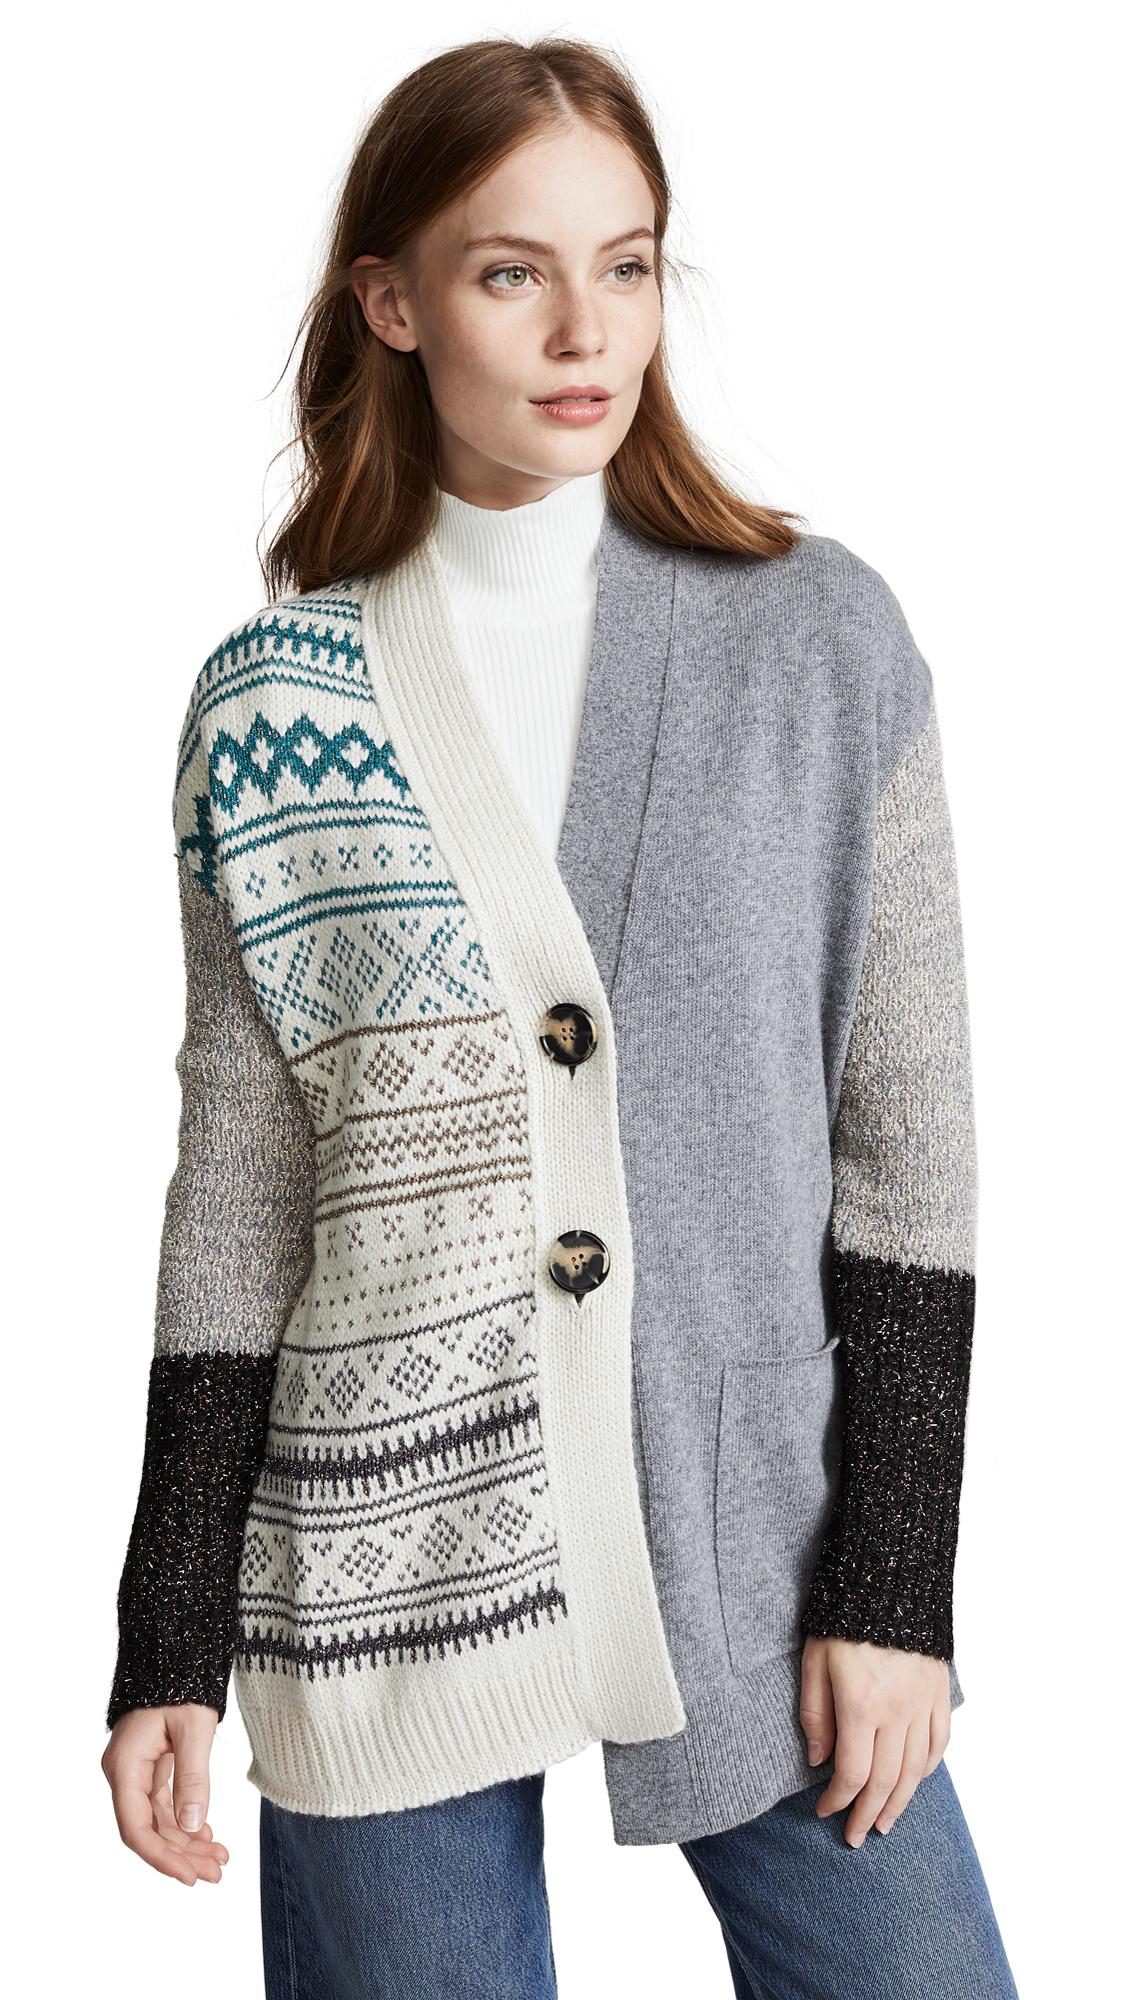 NUDE Knit Cardigan In Grey